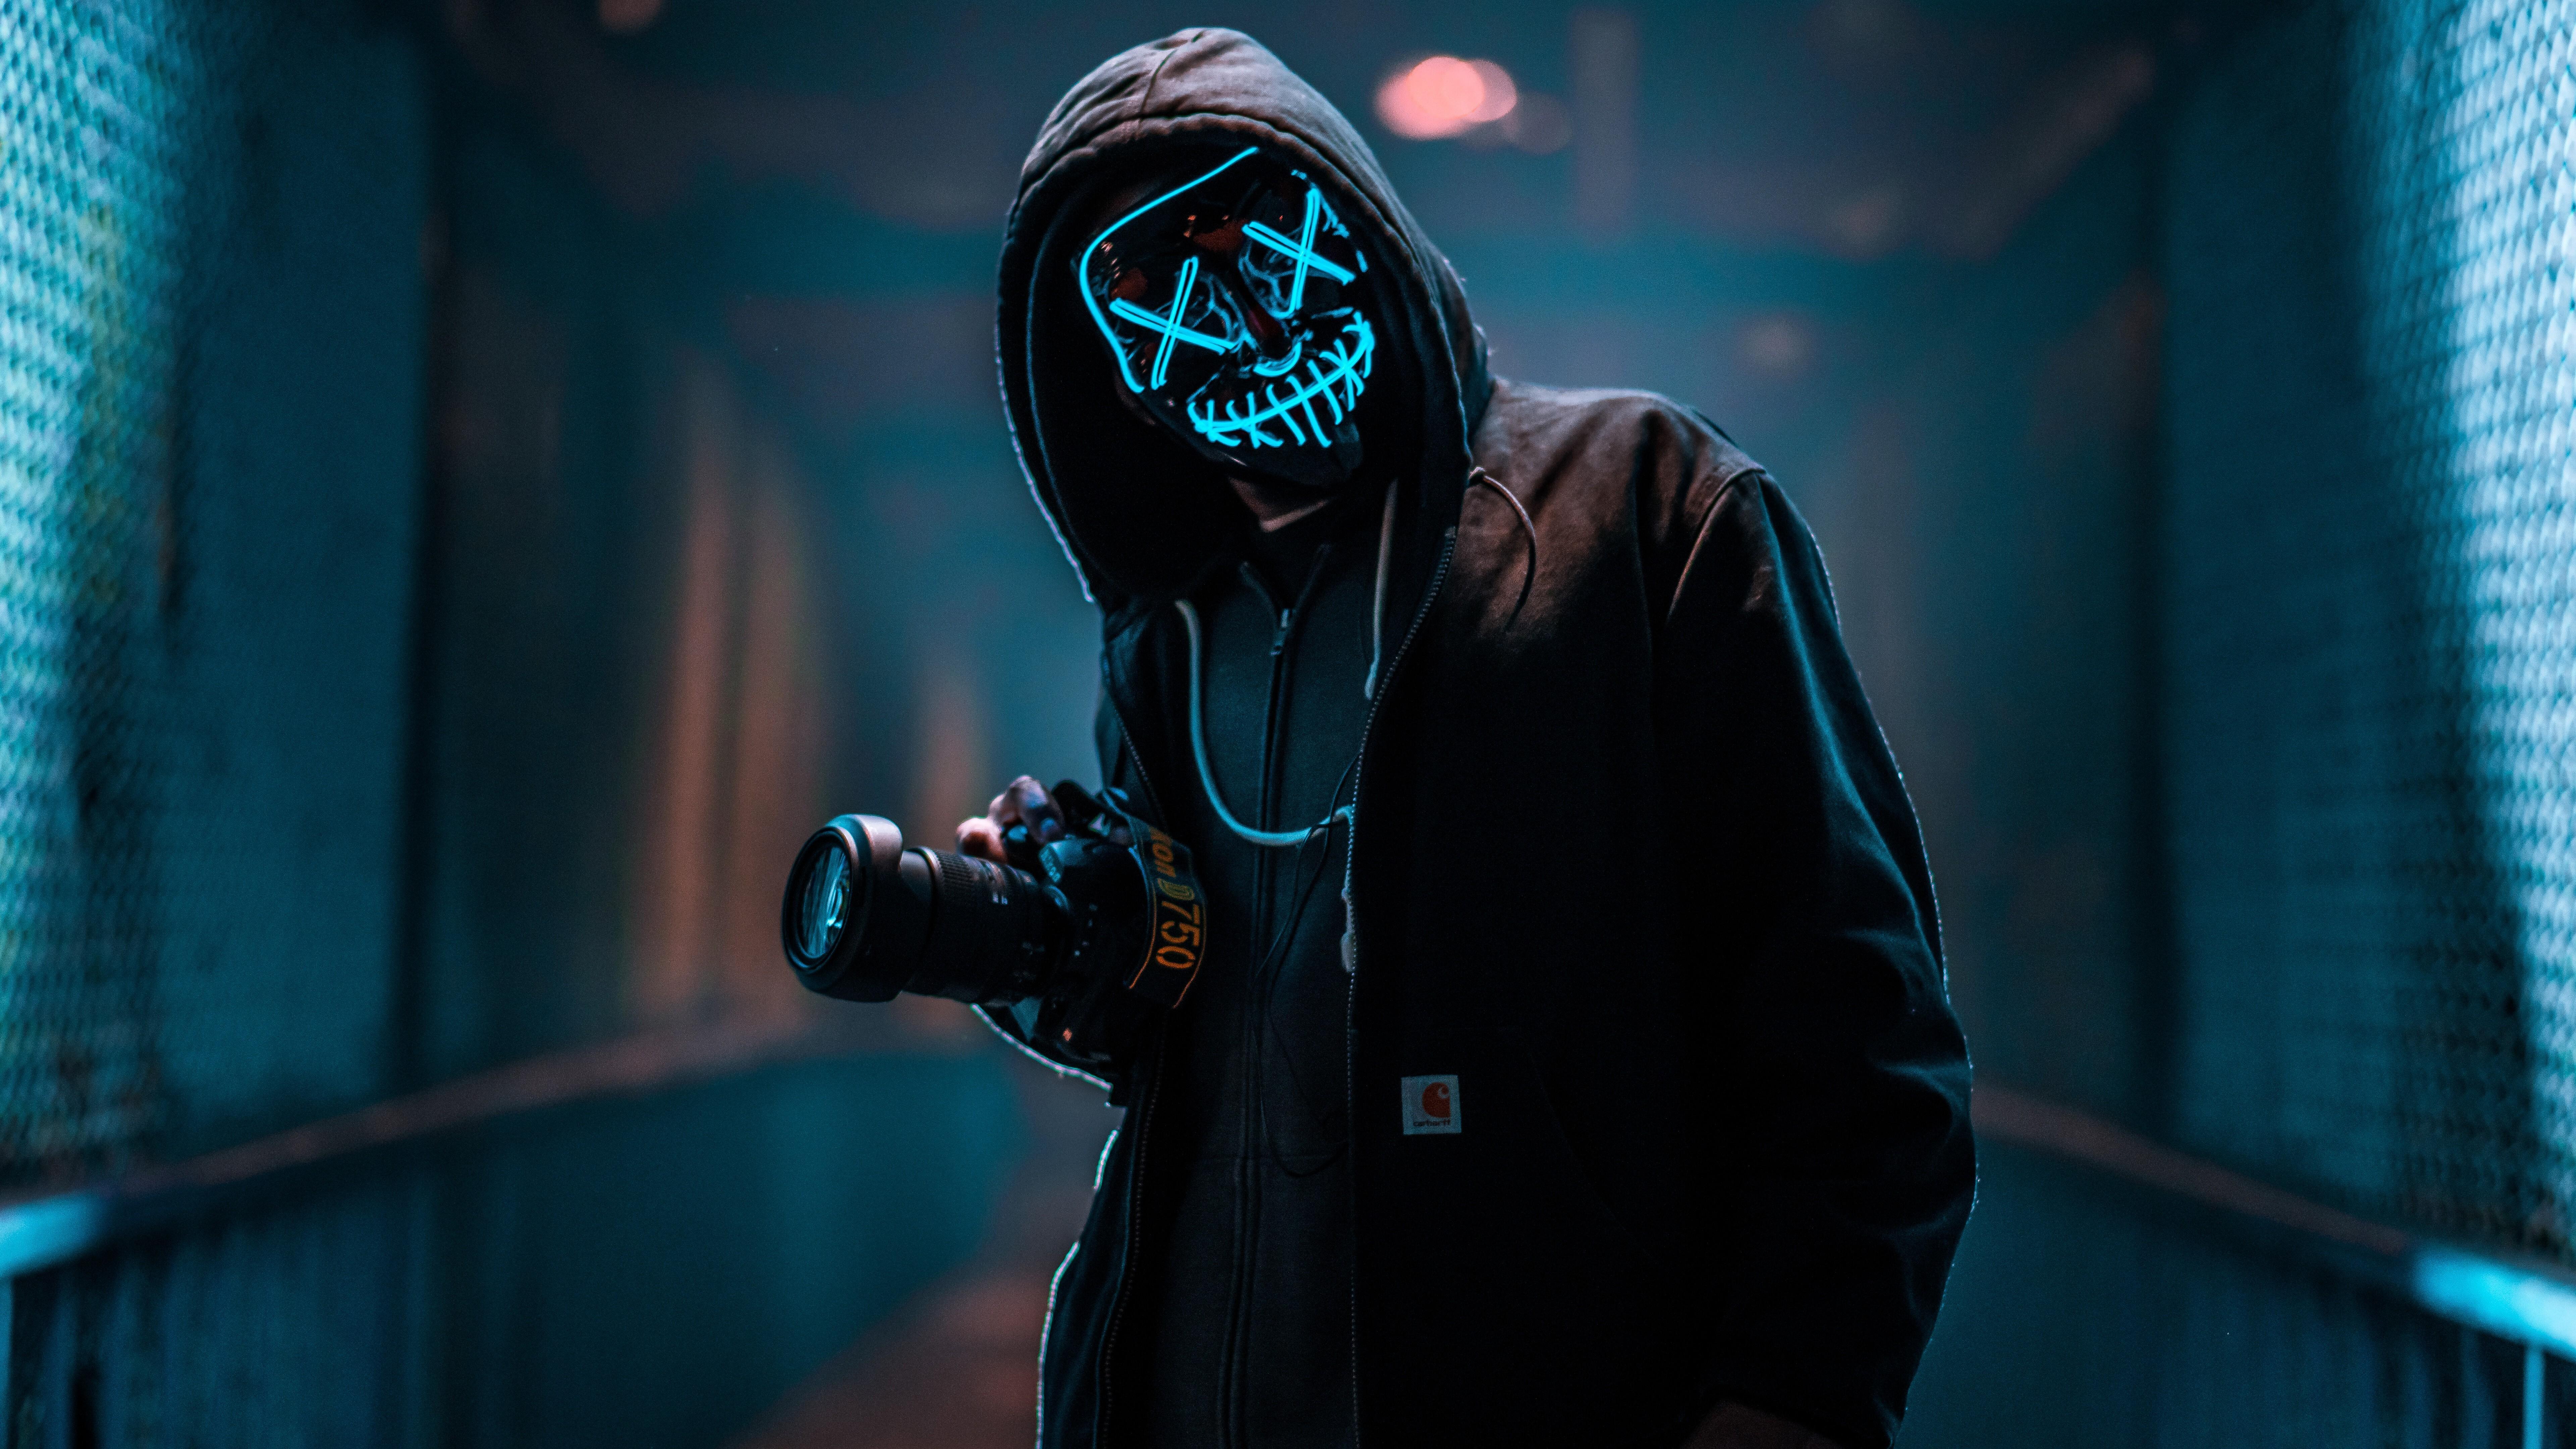 mask-guy-with-dslr-18.jpg